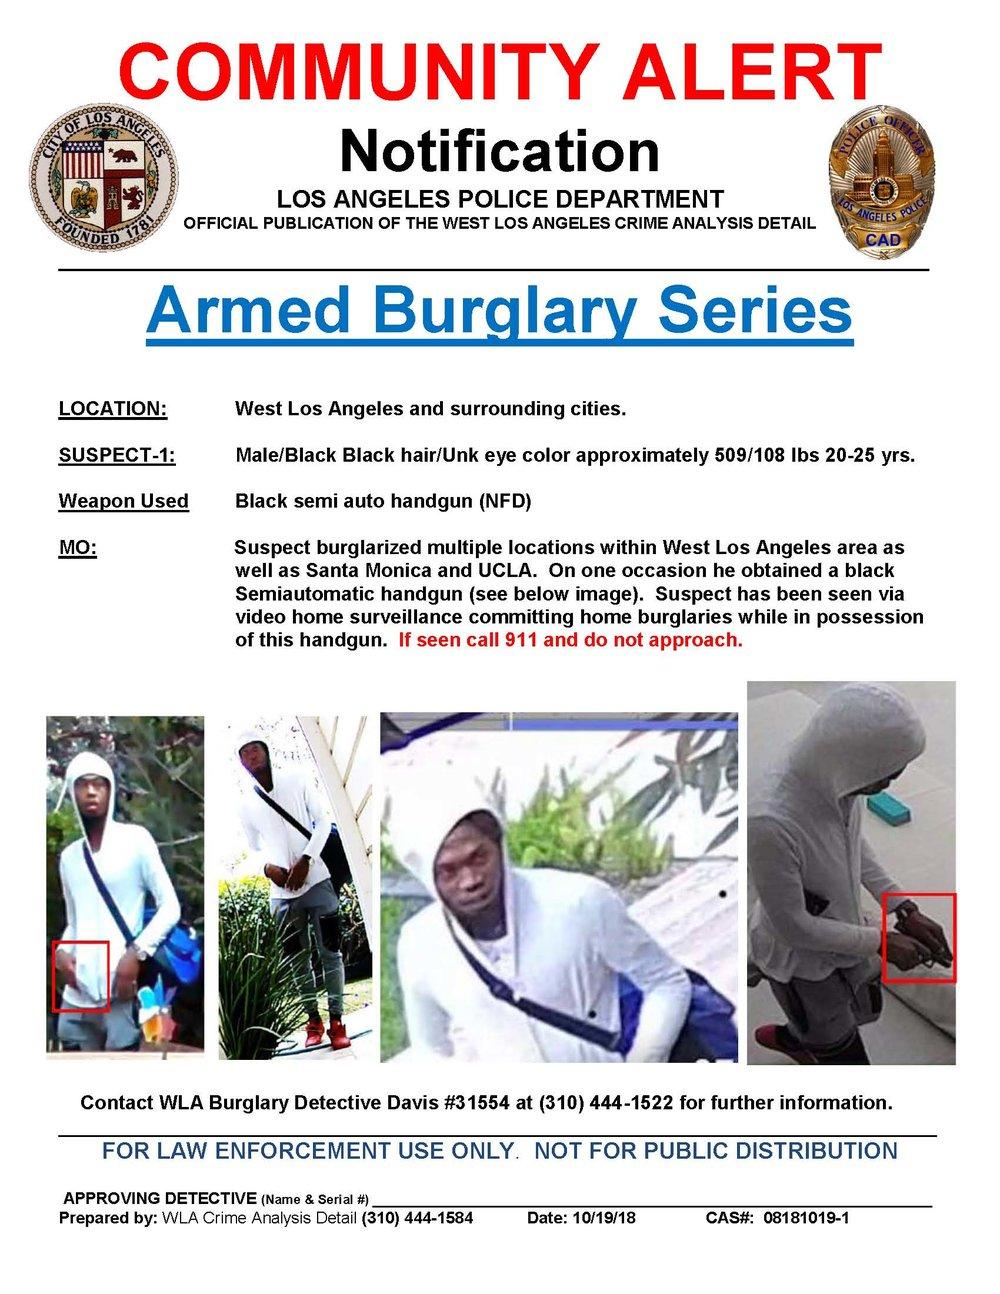 Burglary Community Alert.jpg